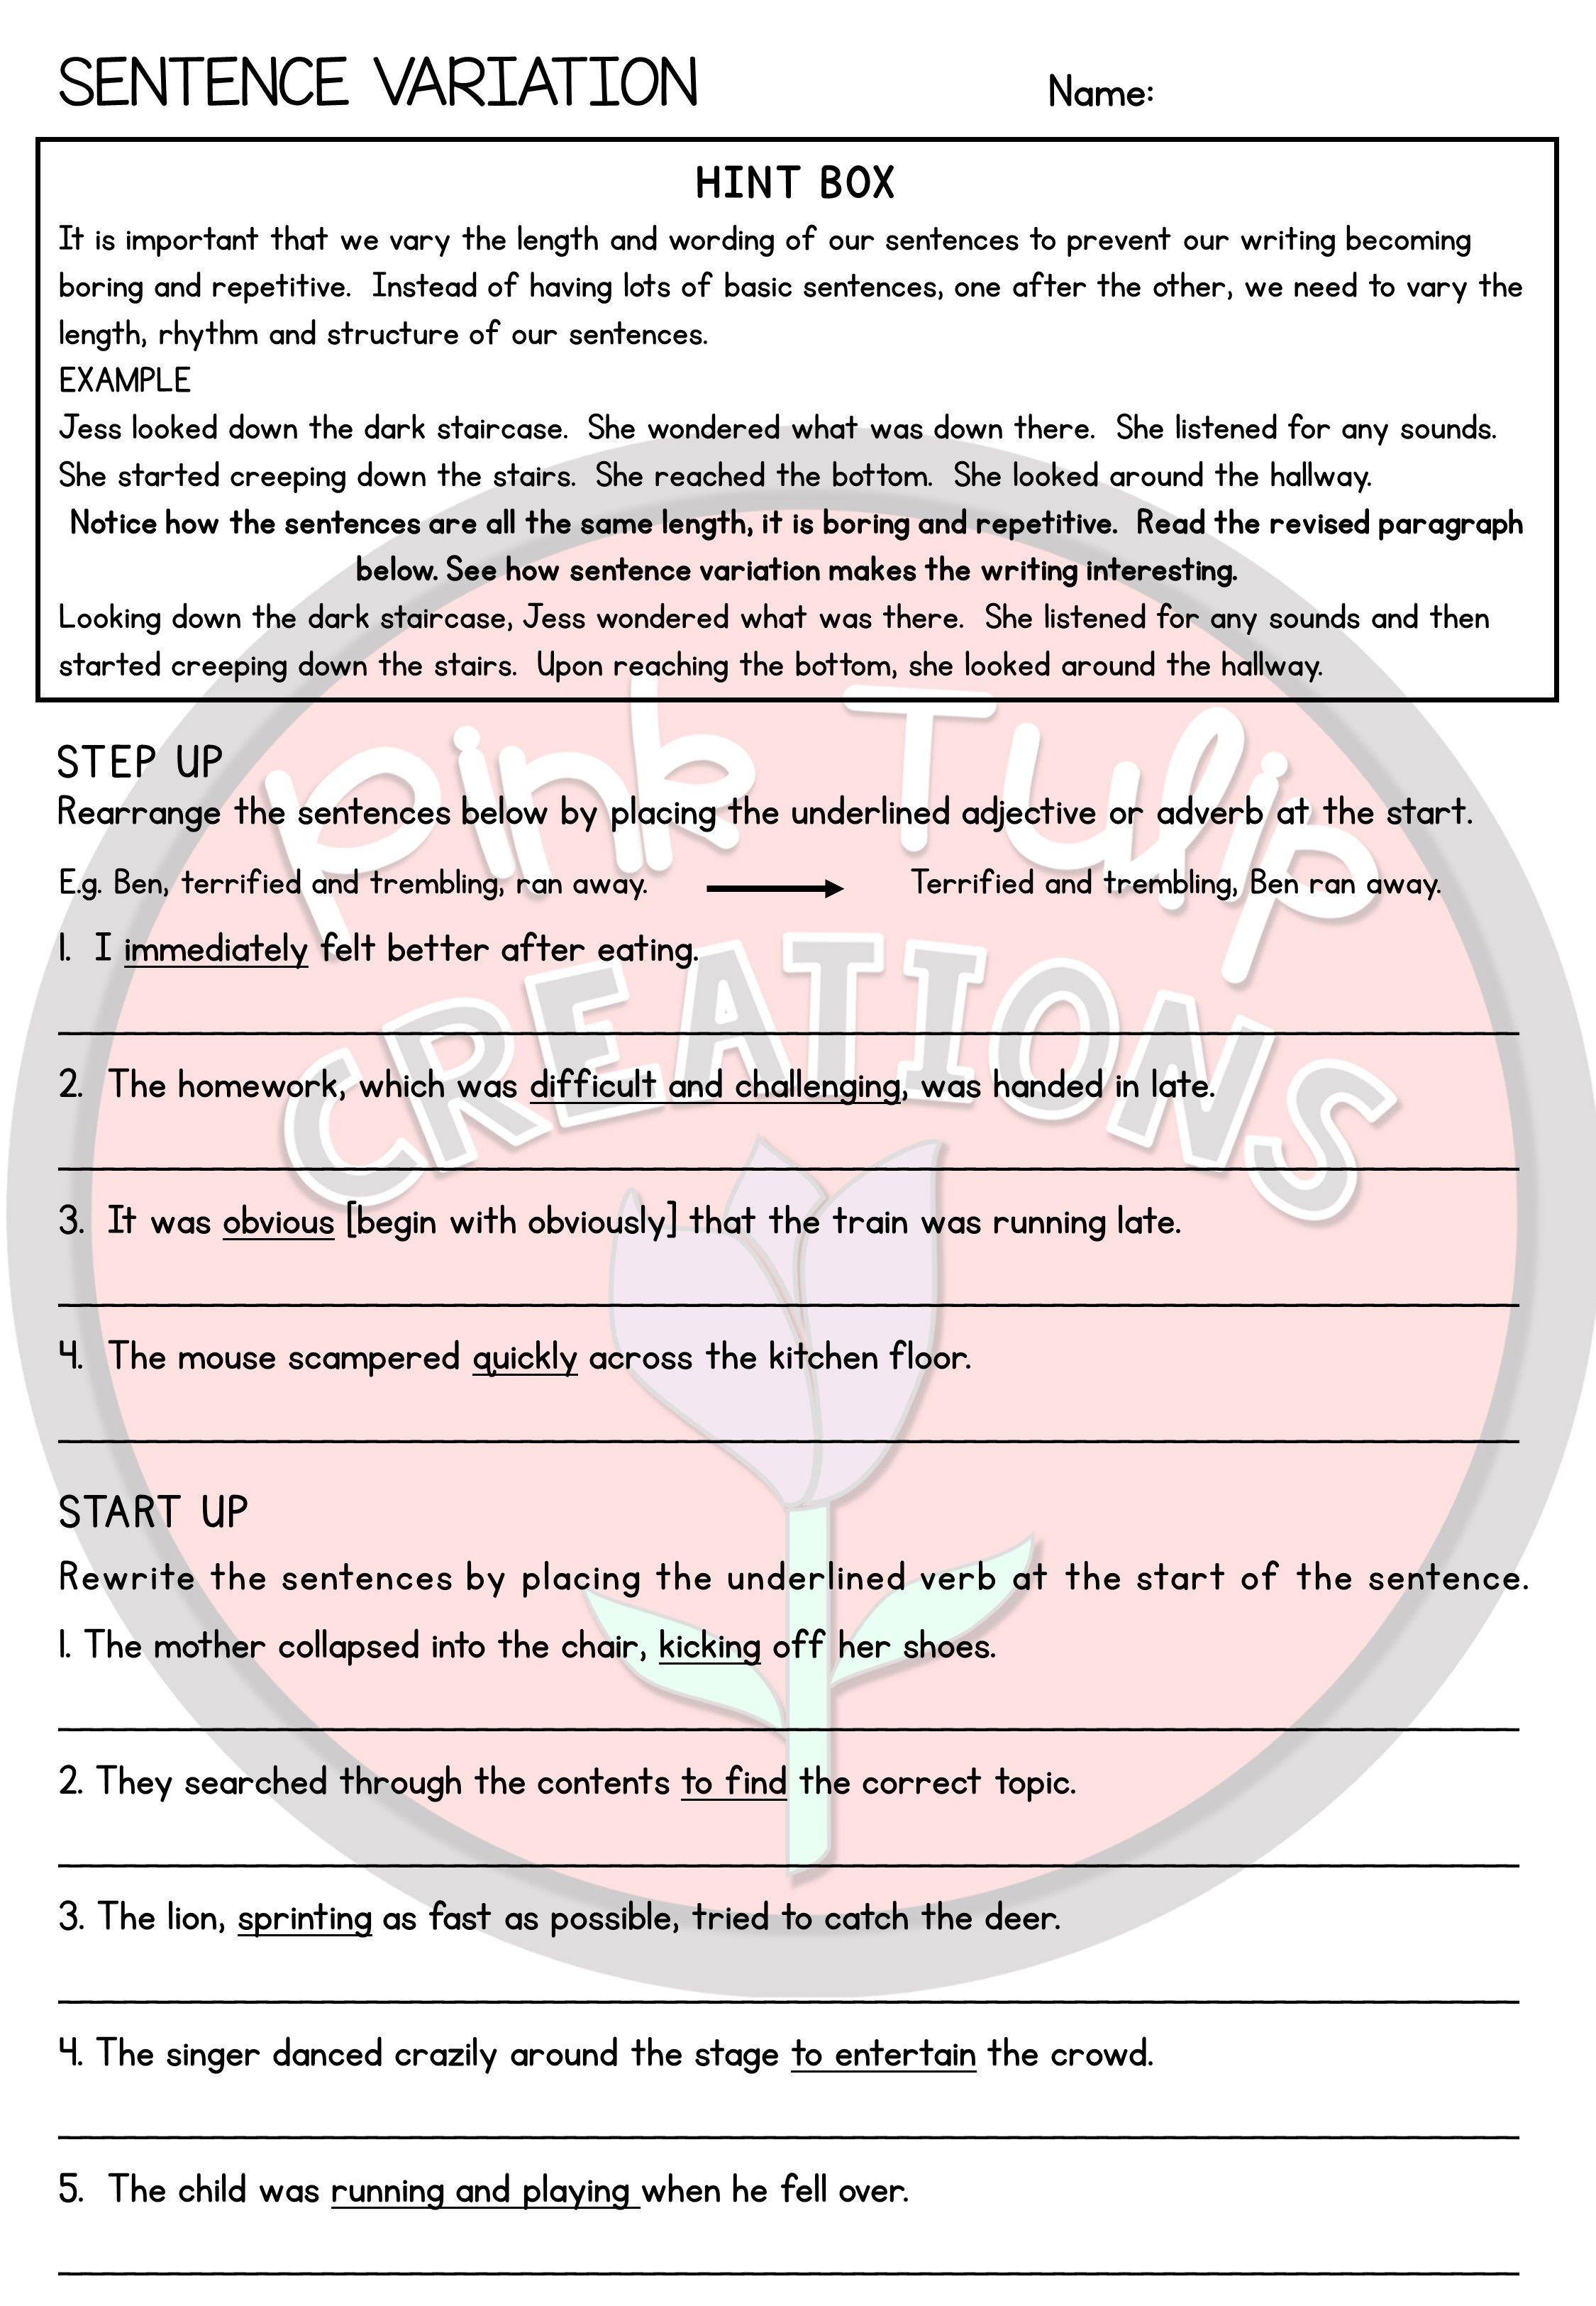 Grammar Worksheet Pack Grammar Worksheets Middle School Writing Activities English Teaching Materials [ 3250 x 2250 Pixel ]